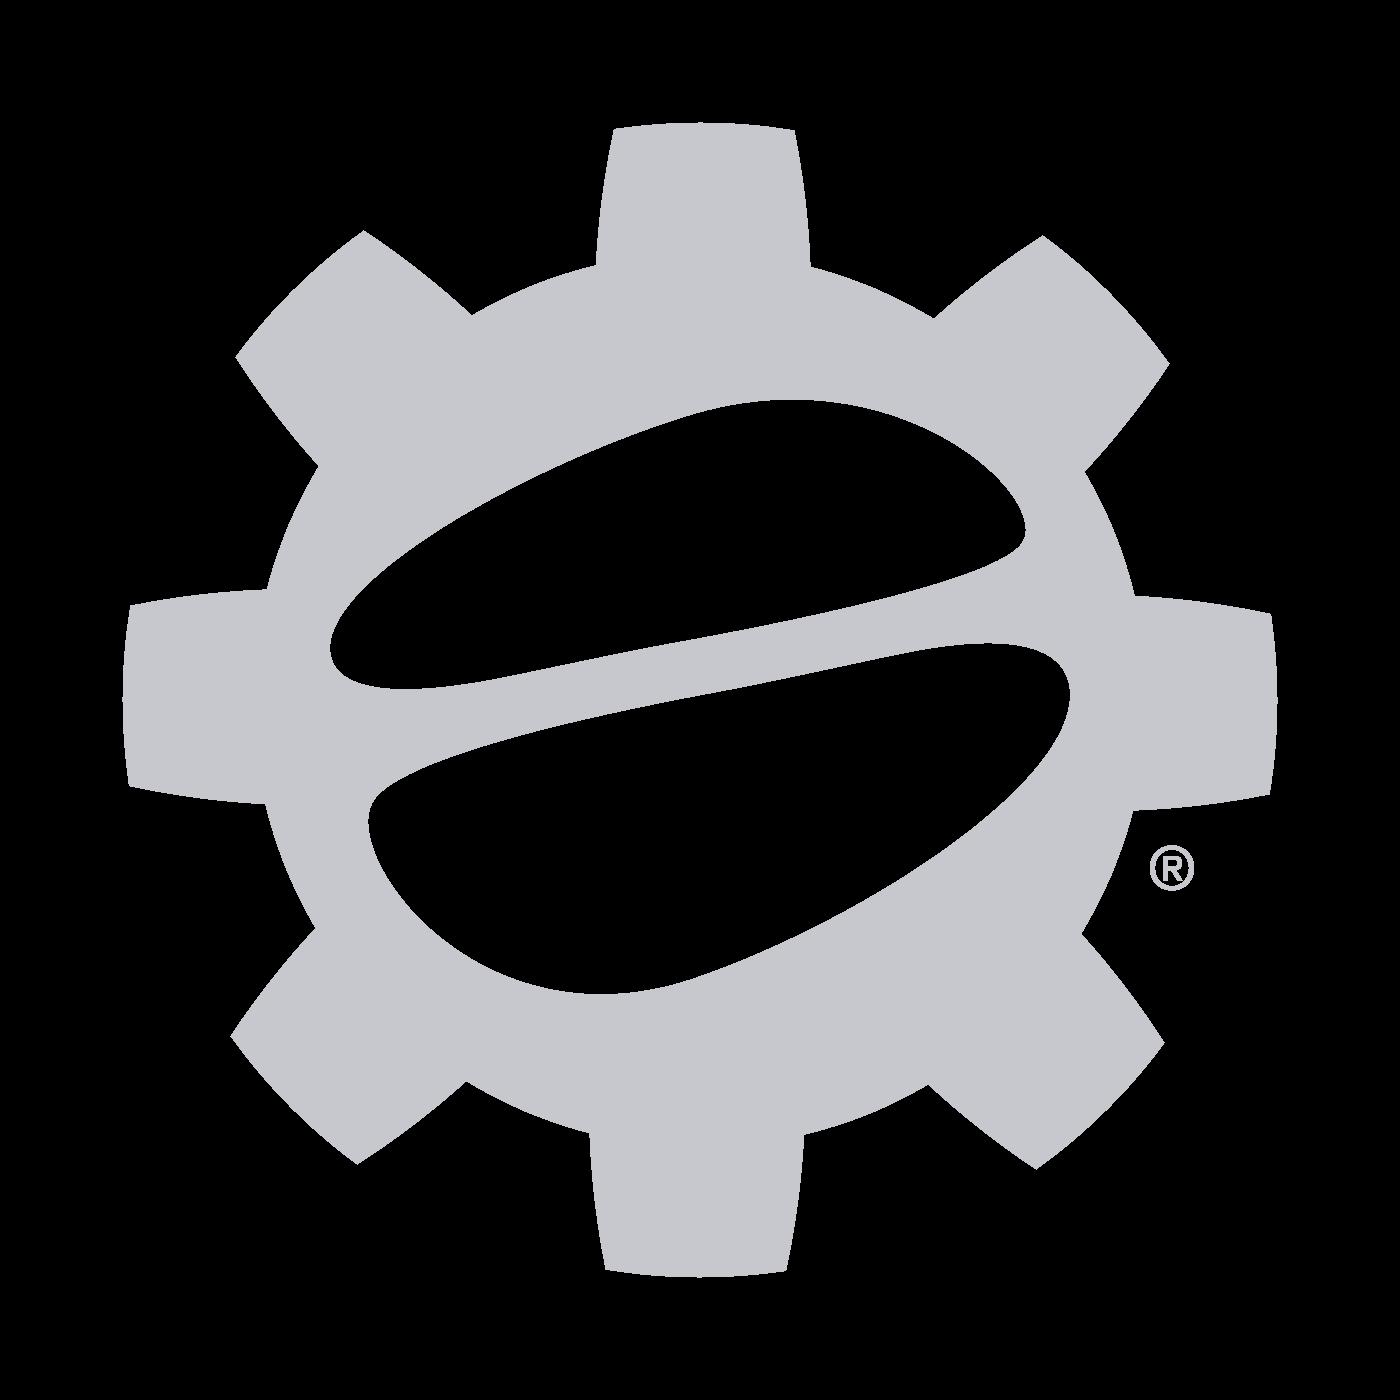 Hario Buono Coffee Drip Kettle